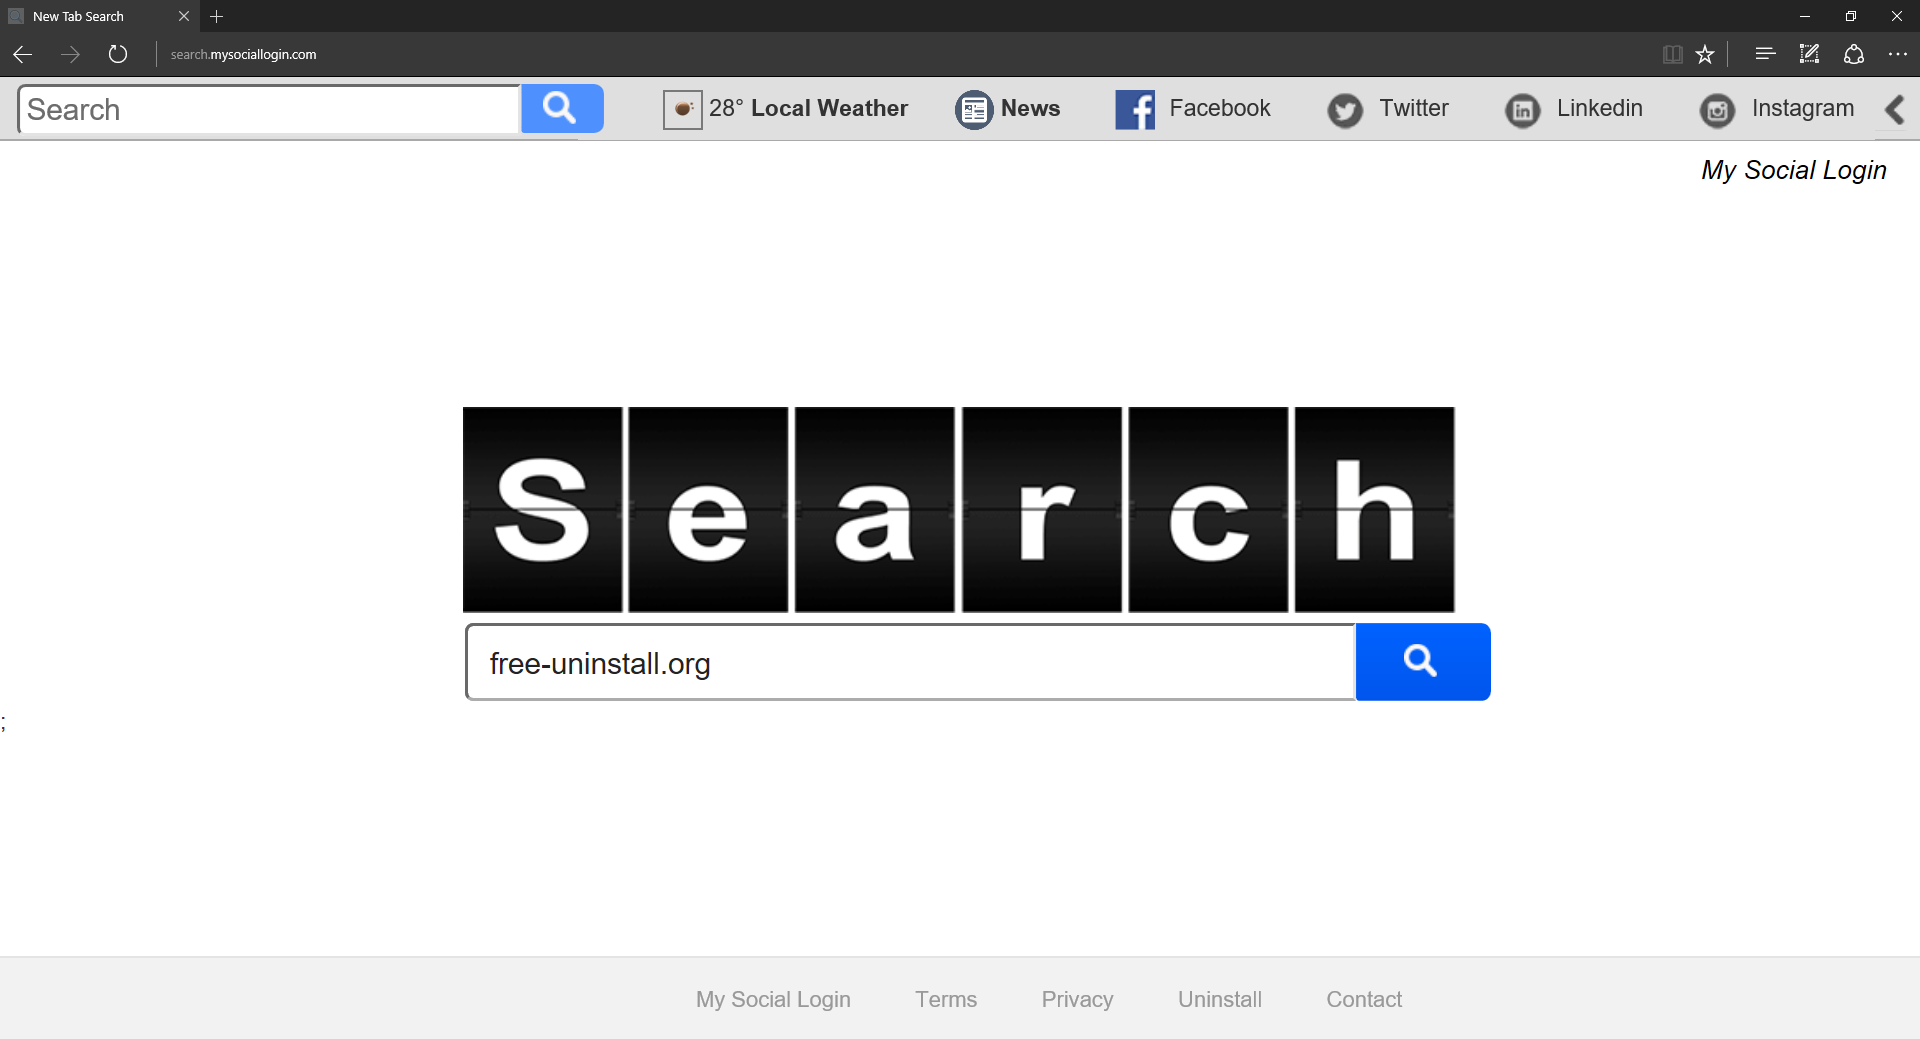 Search.mysociallogin.com Hijacker